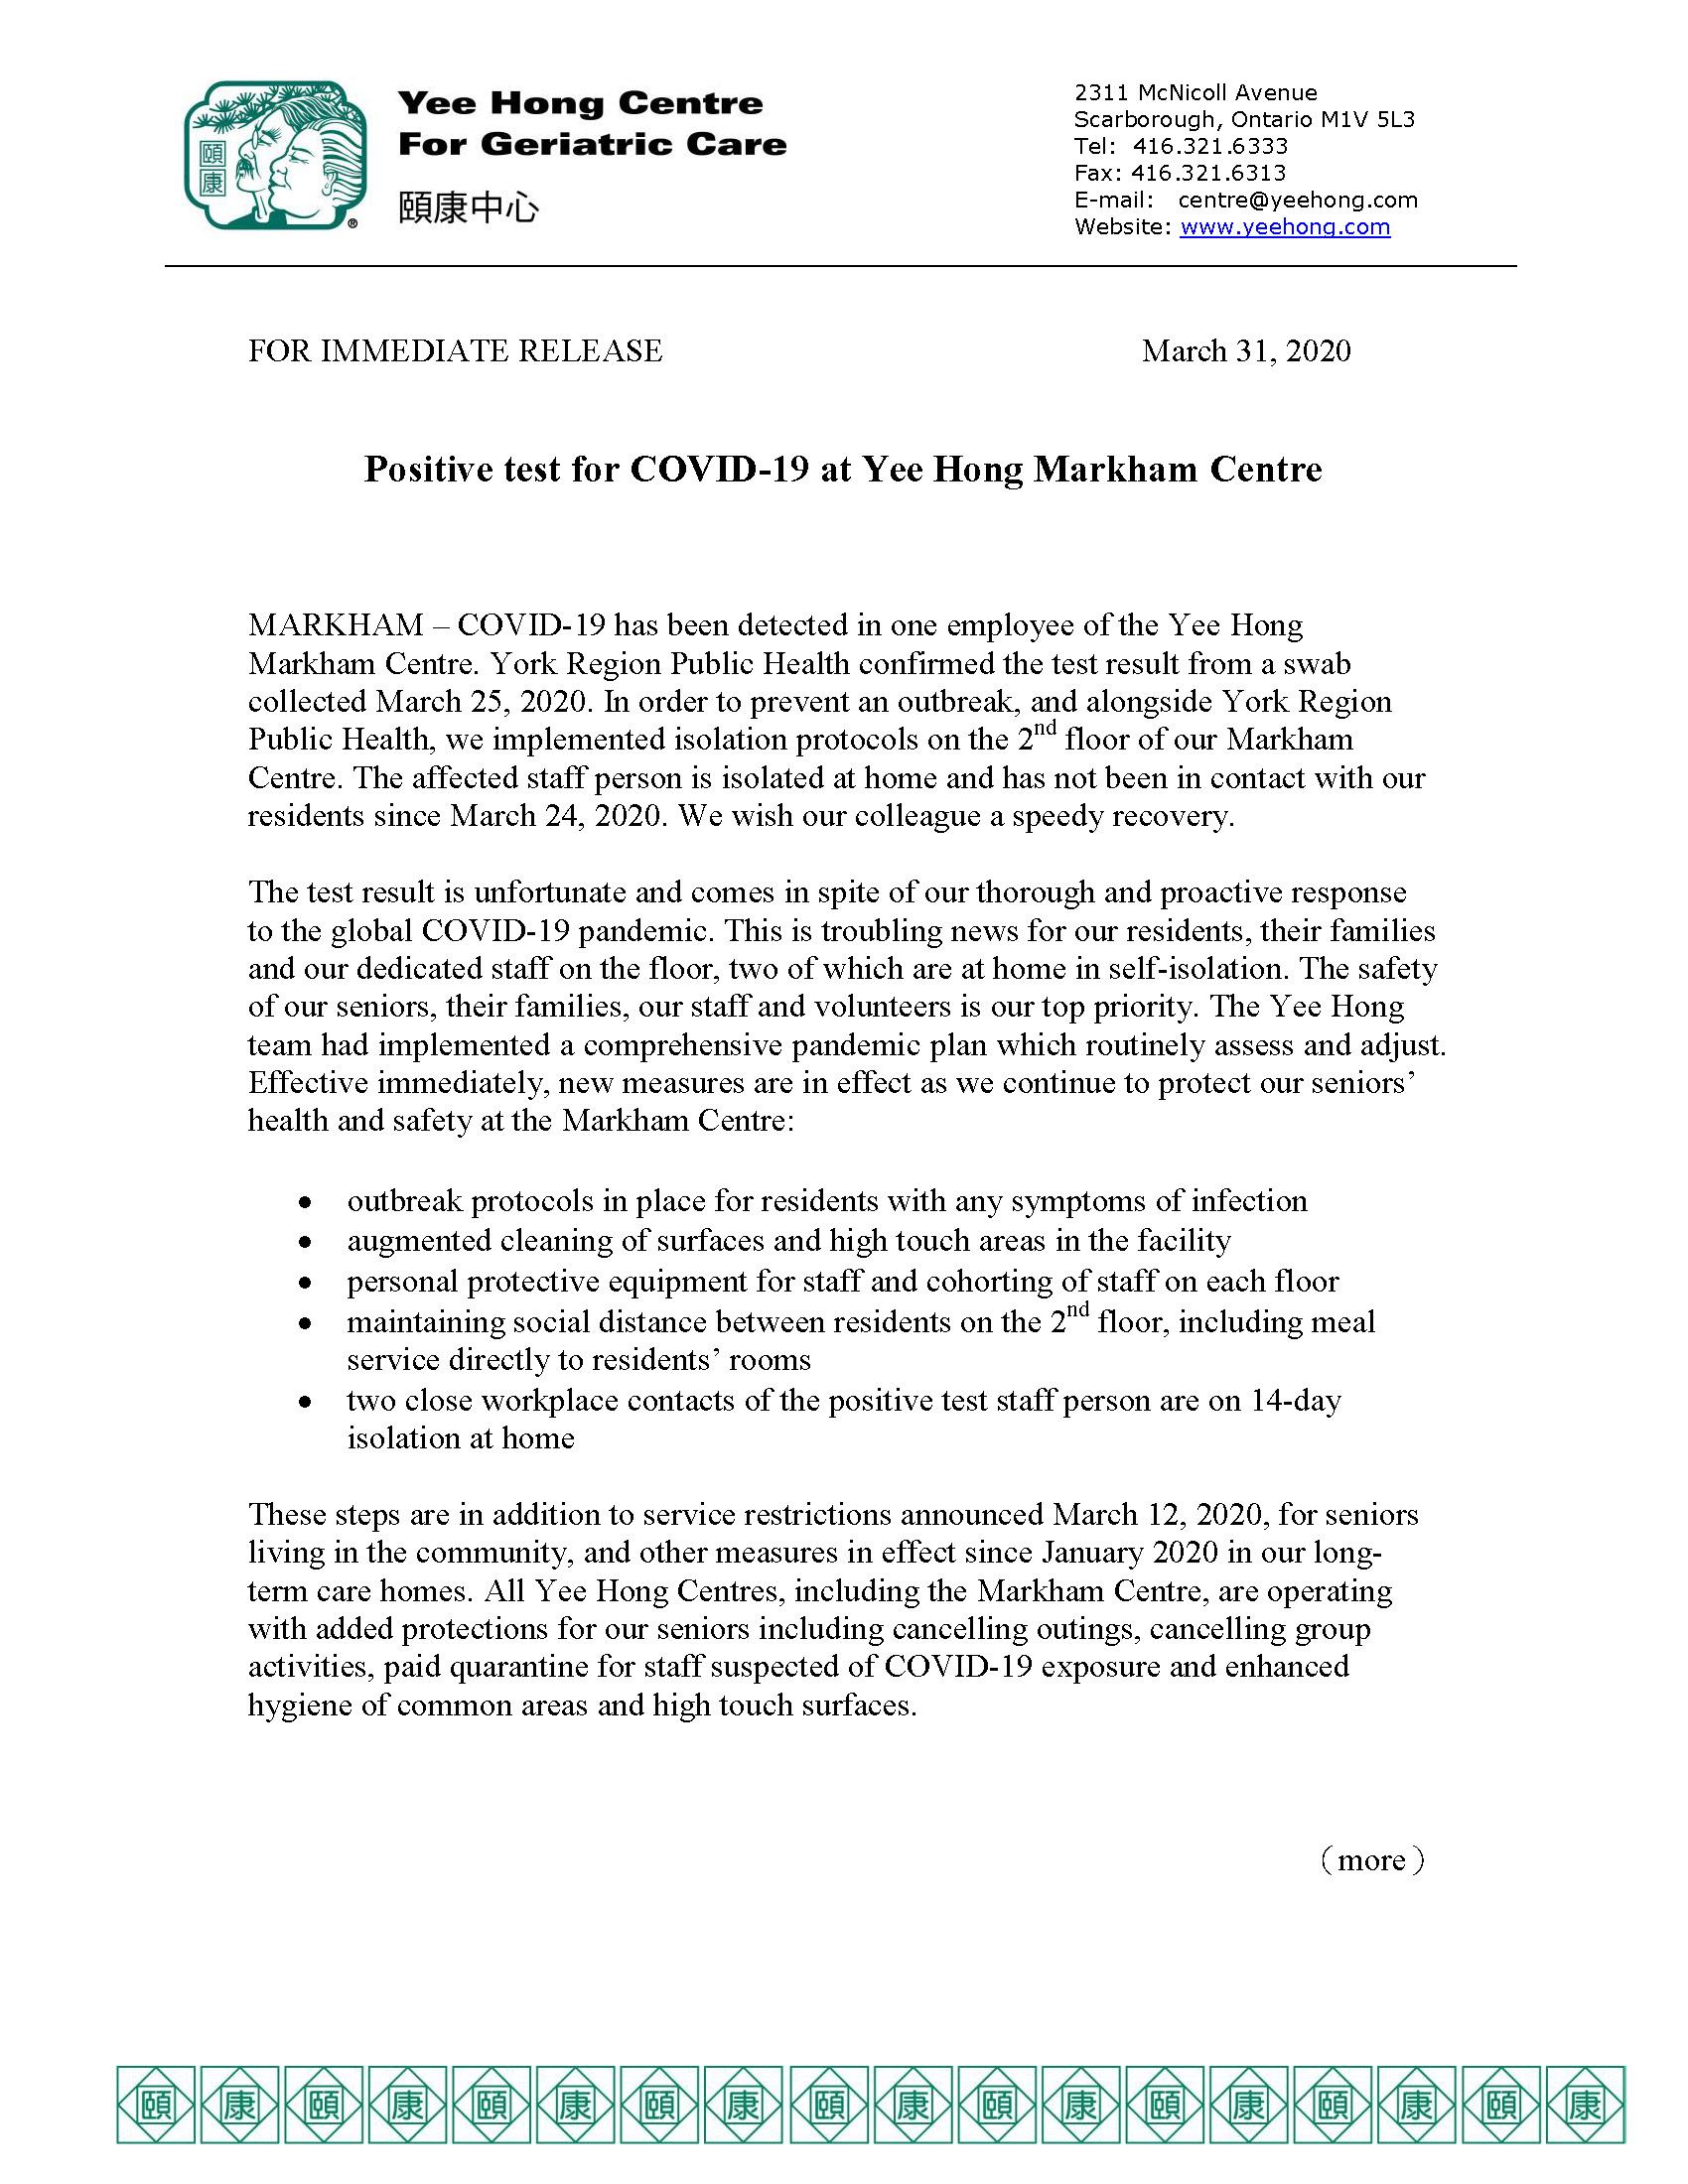 News Release Mar 31, 2020